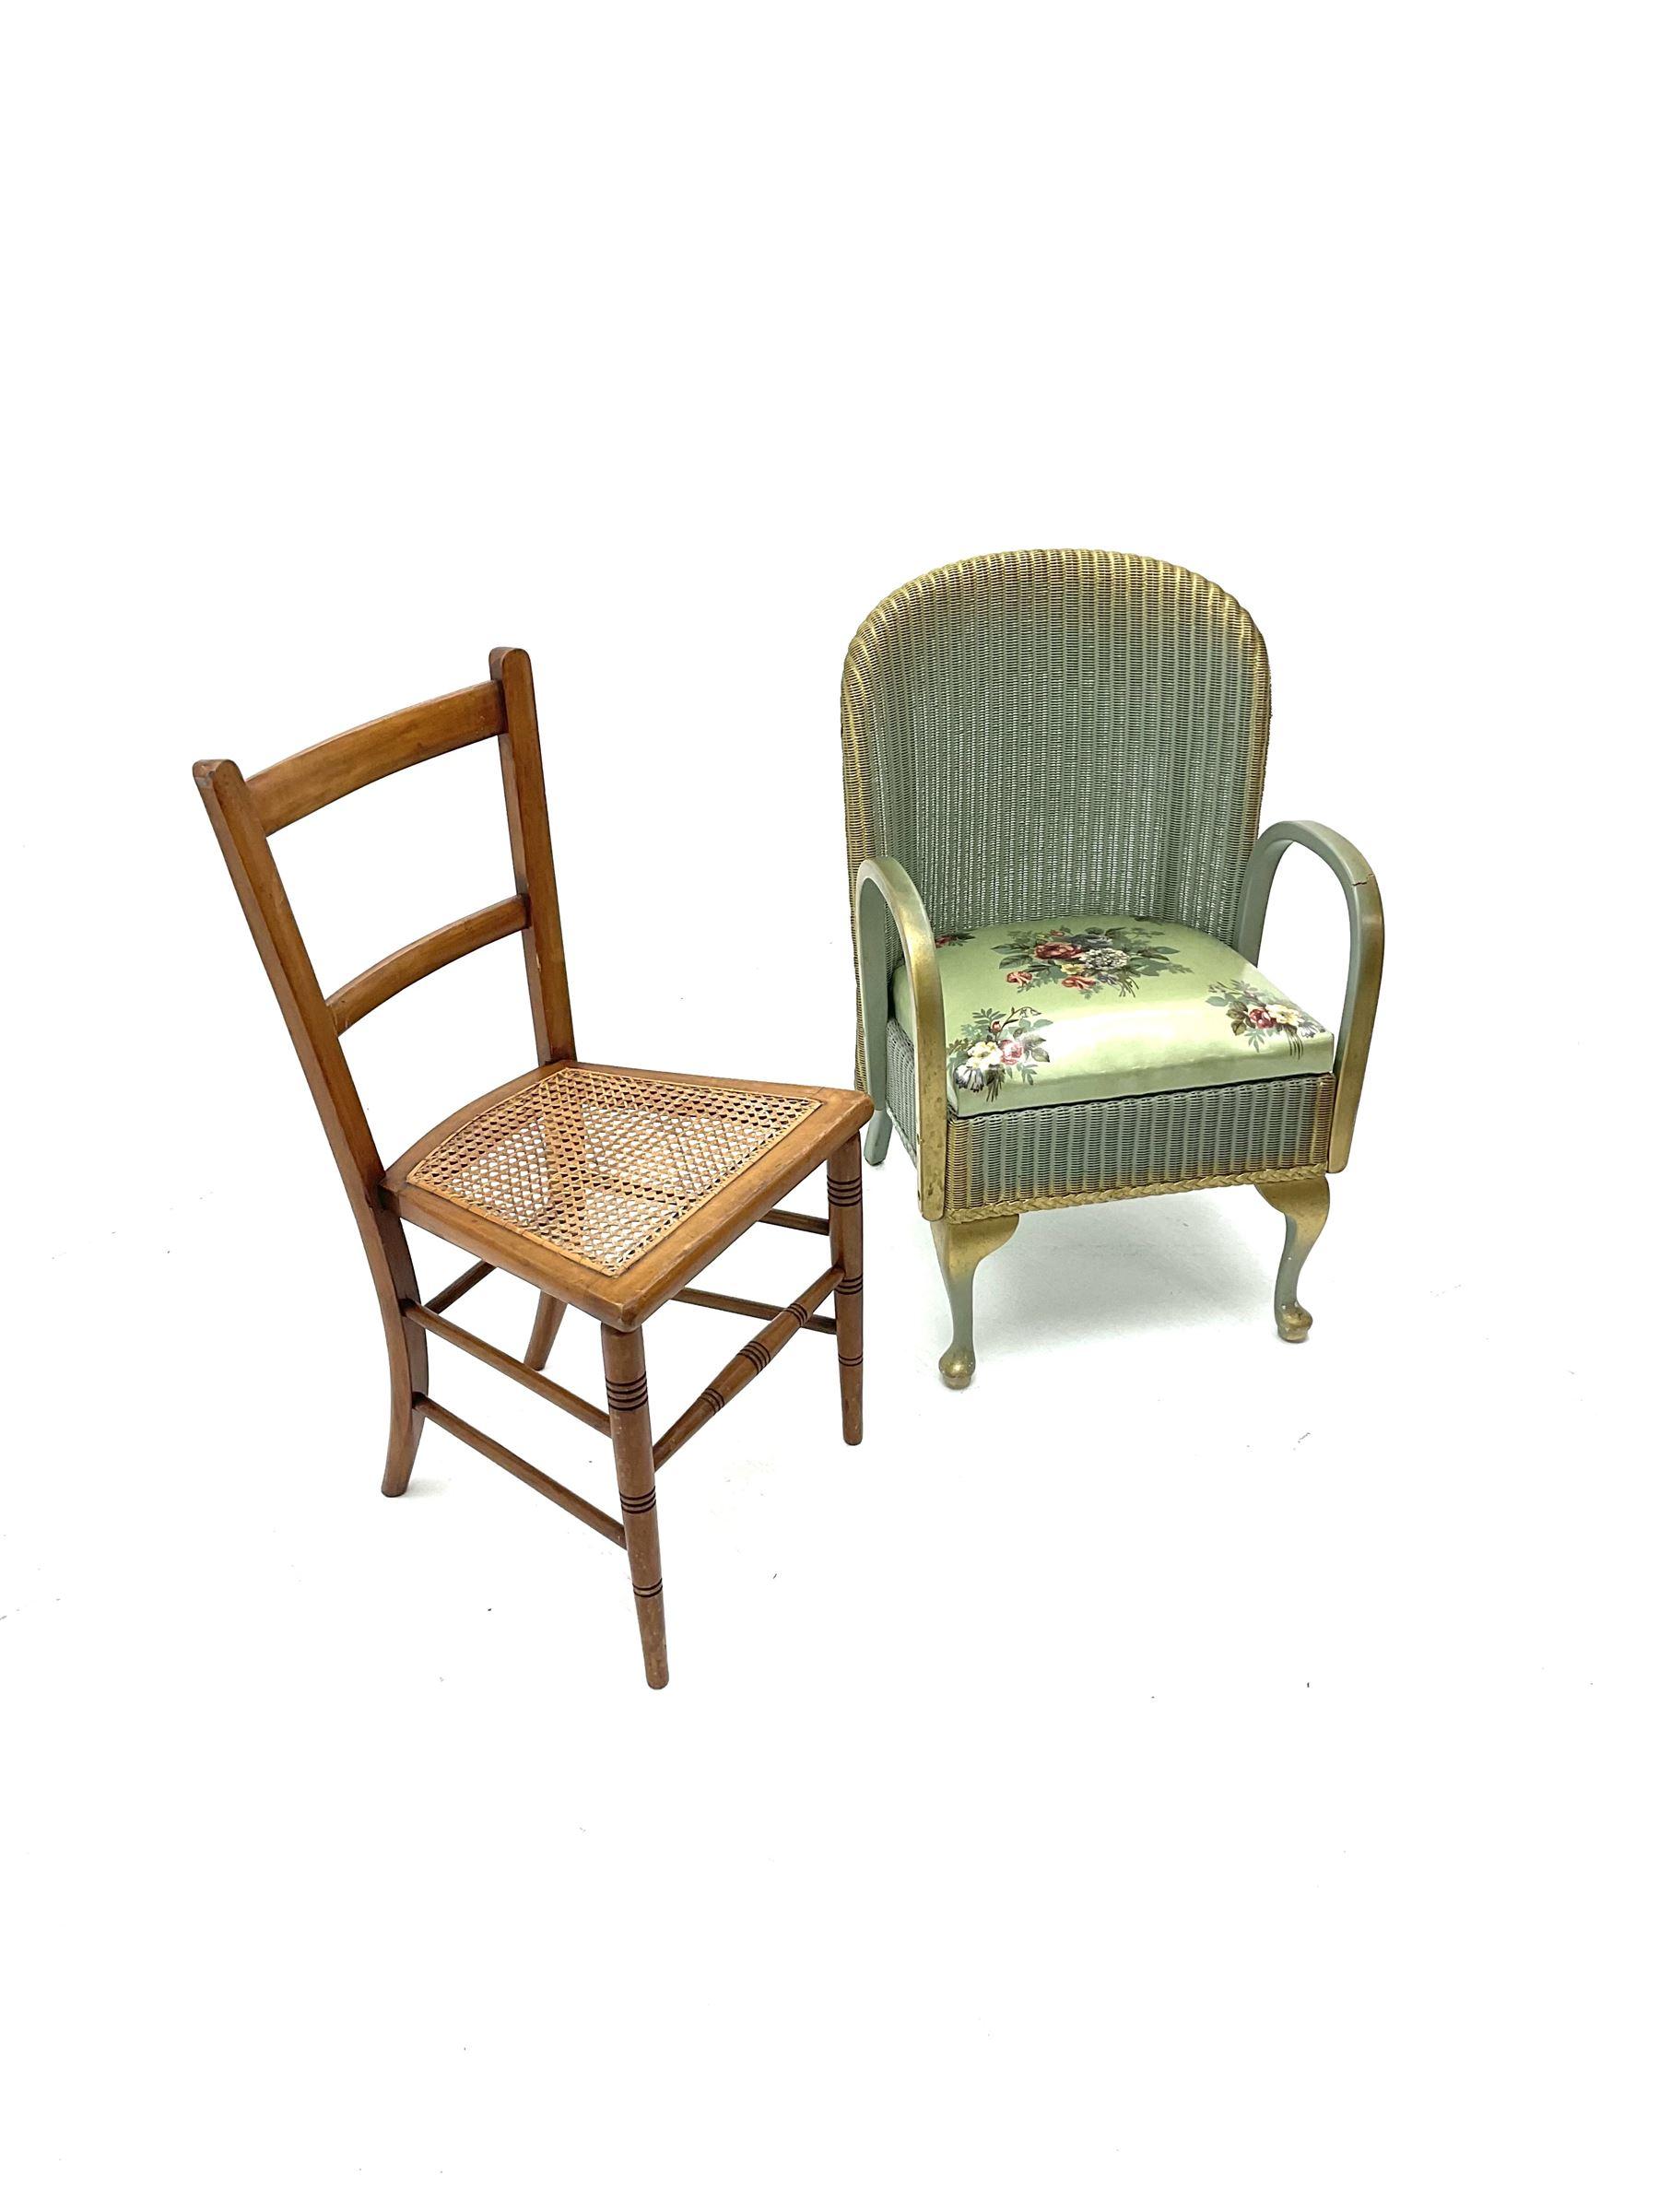 Loyd loom style chair - Image 3 of 3